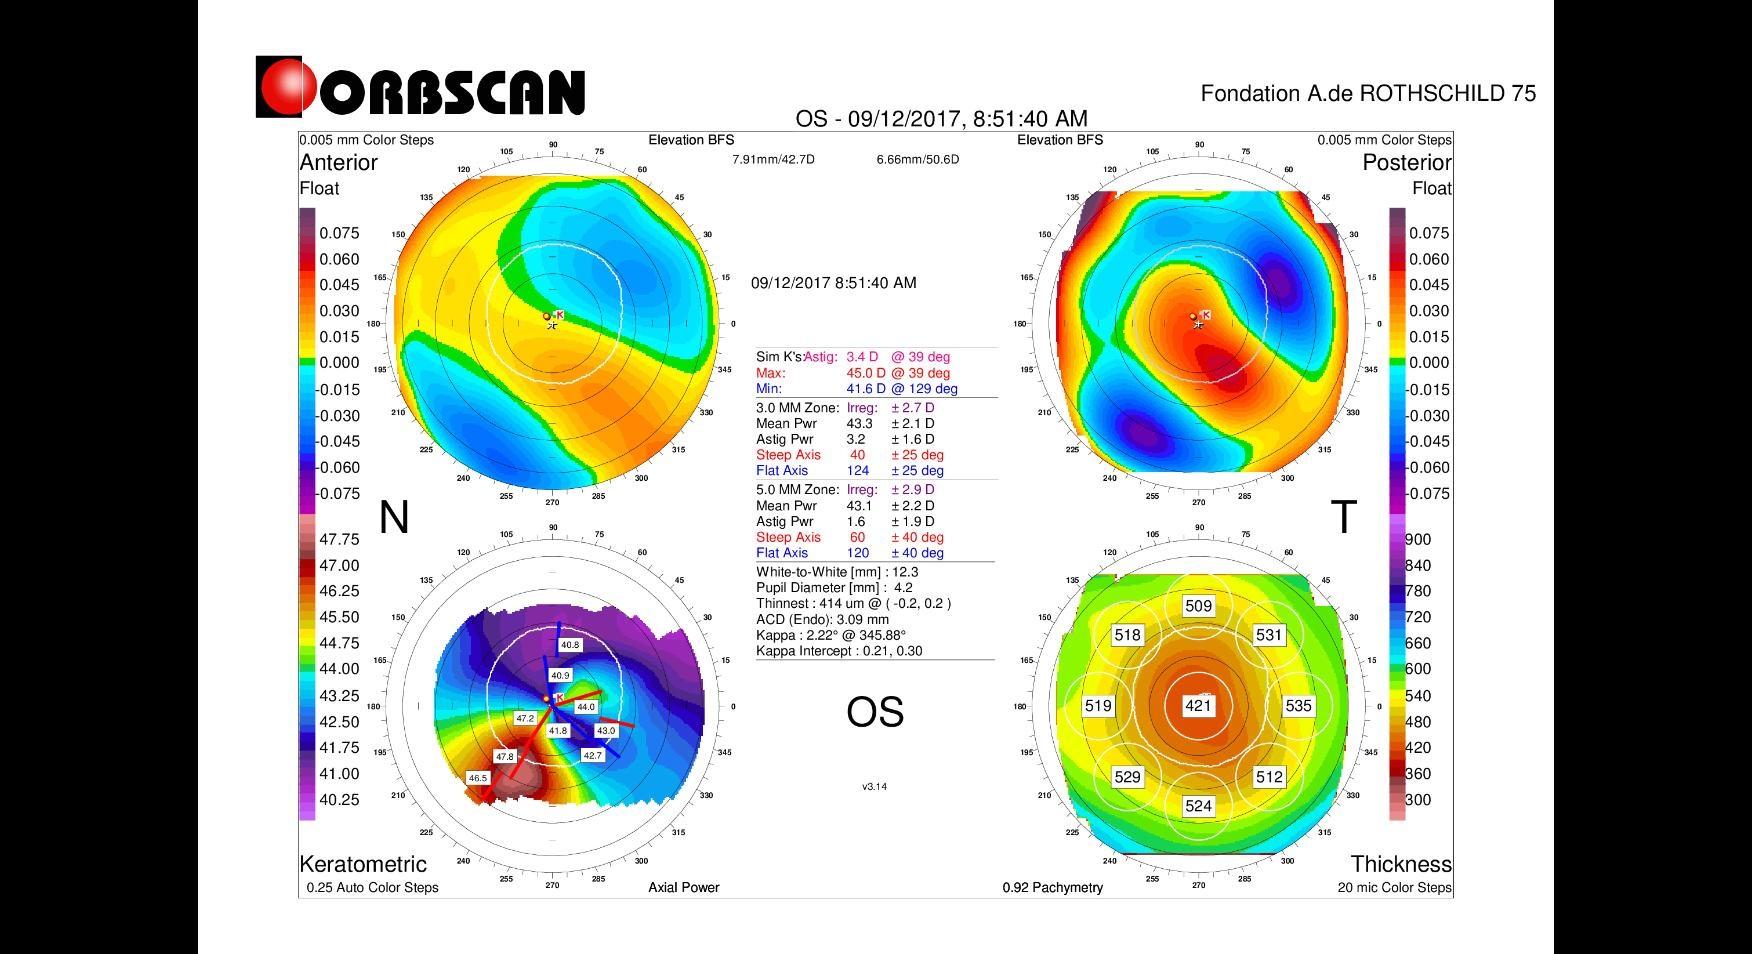 post LASIK ectasia Orbscan map